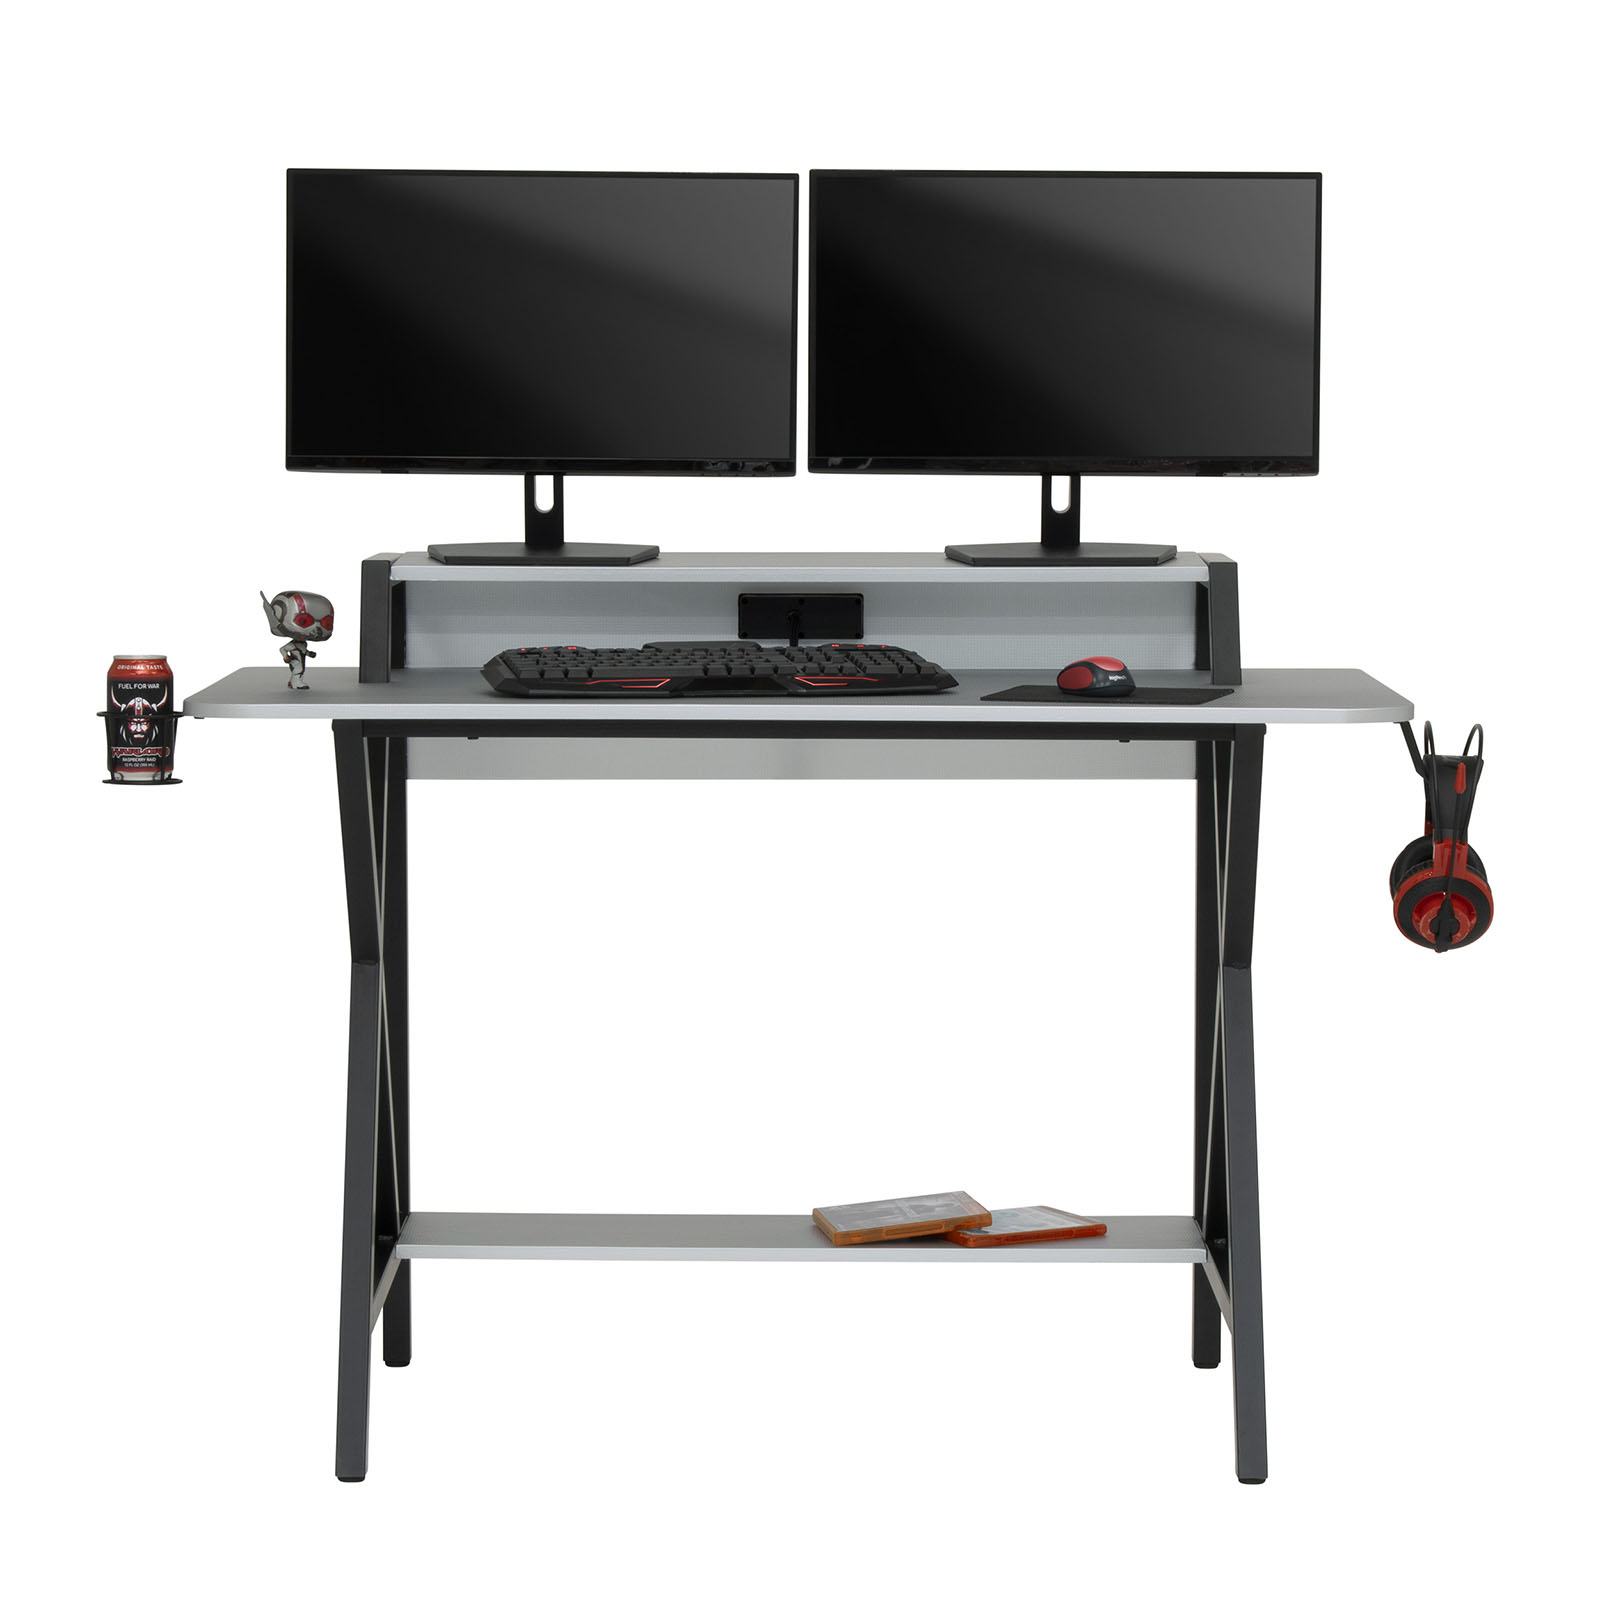 51256 Challenger Desk props 2bDual